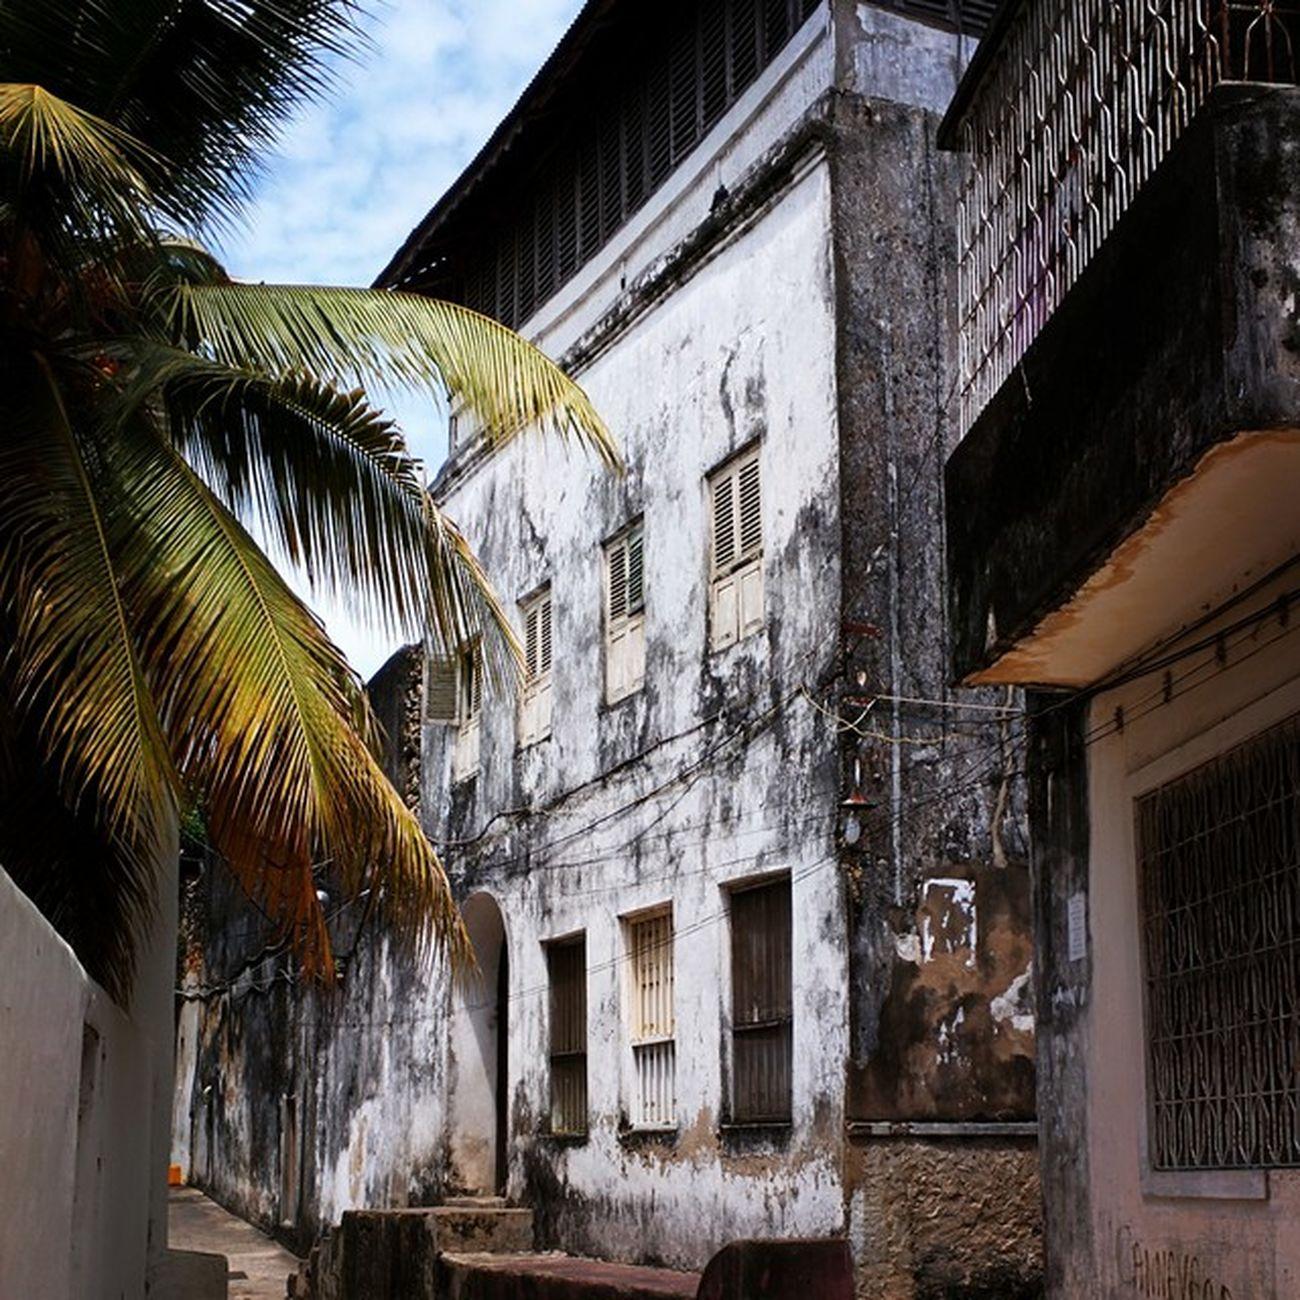 Zanzibar Stonetown Old Building Palm Oldtown Unguja Tia Tanzania Unesco Arabic African MeltingPot